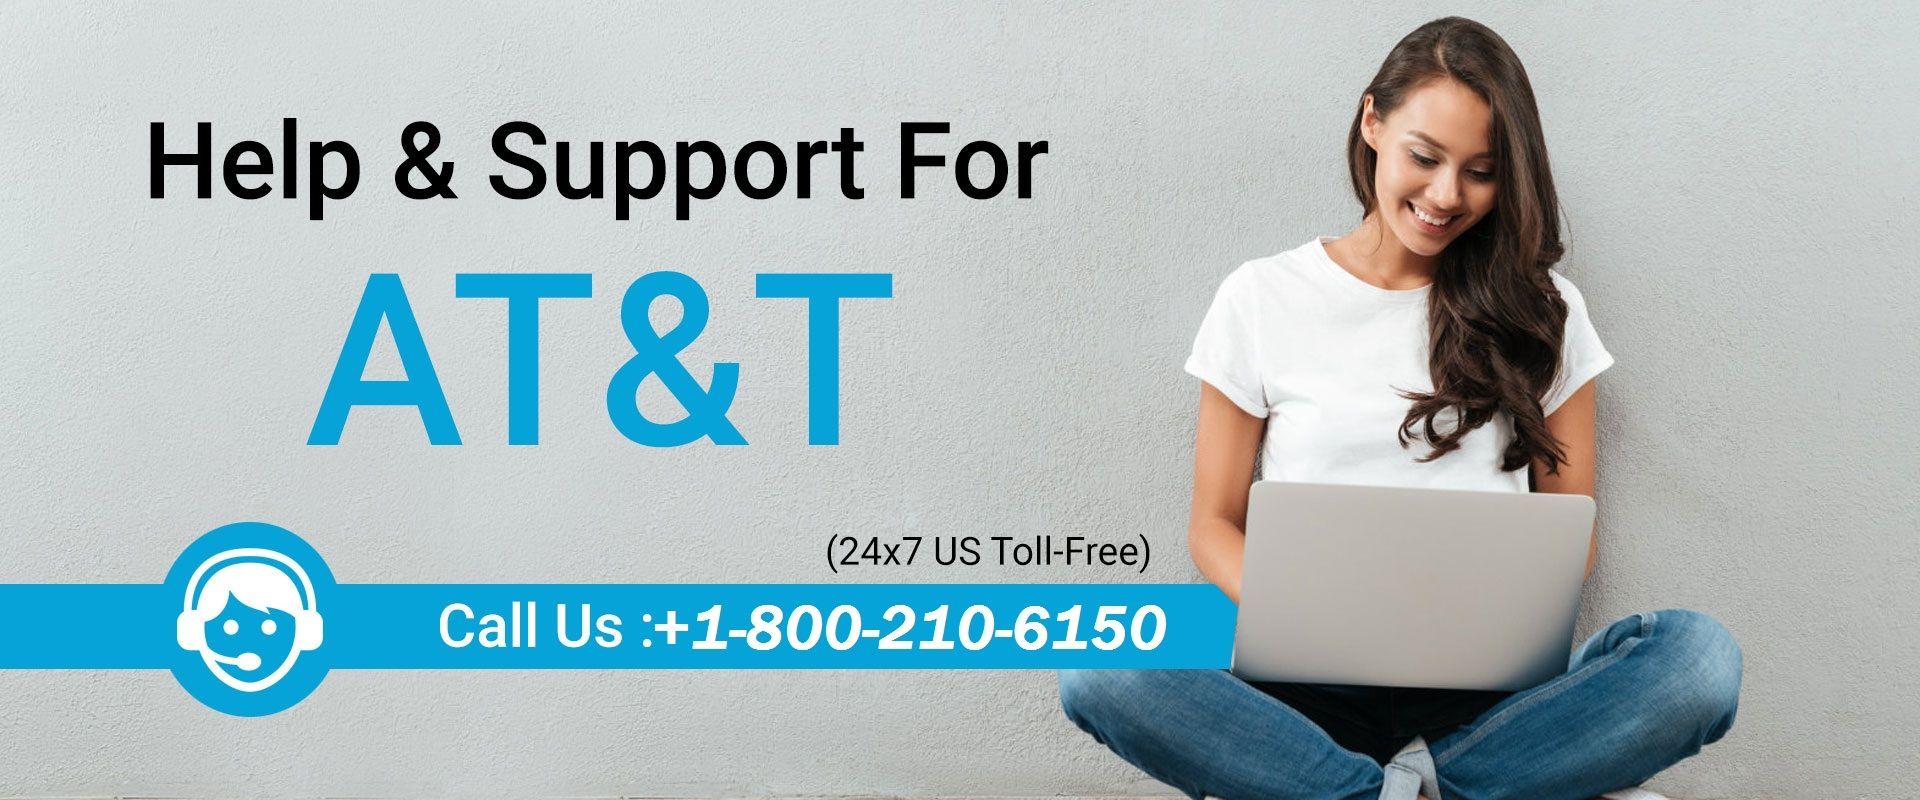 Customers of ATT email customer benefit phone number +1